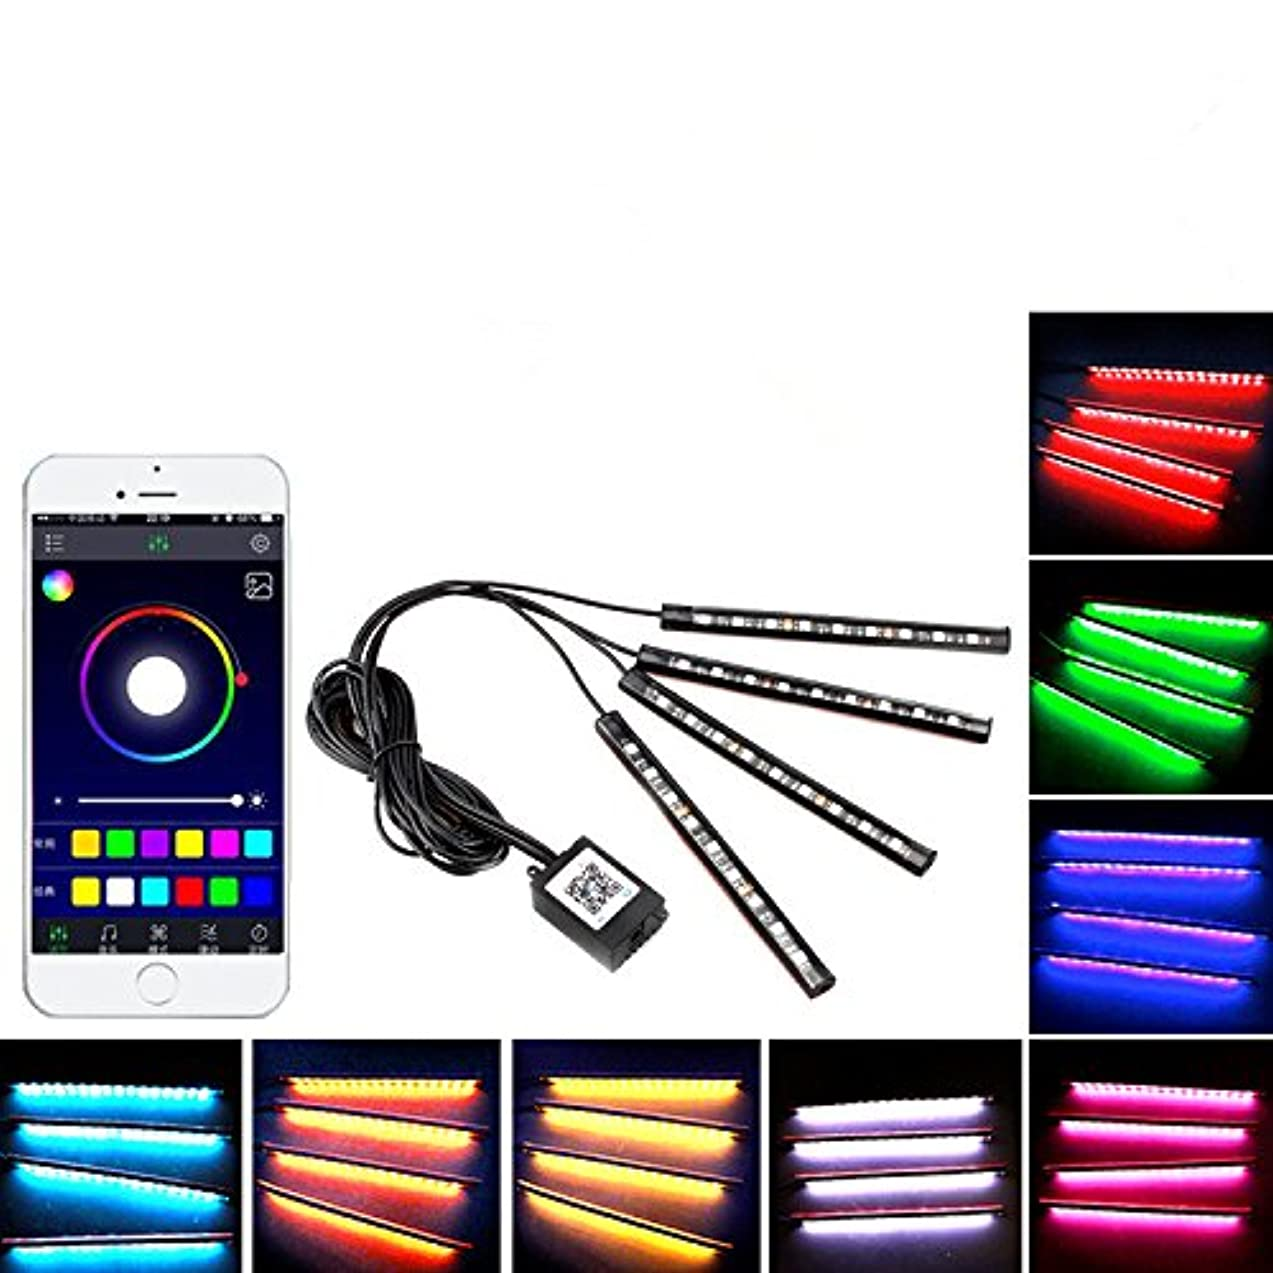 SJPLIght Car LED Strip Lights, 4 Pcs 48 LEDs Car Interior RGB Music Atmosphere Floor Underdash Lights, APP Control Bluetooth Light Kit for Iphone/Android/Google Phones